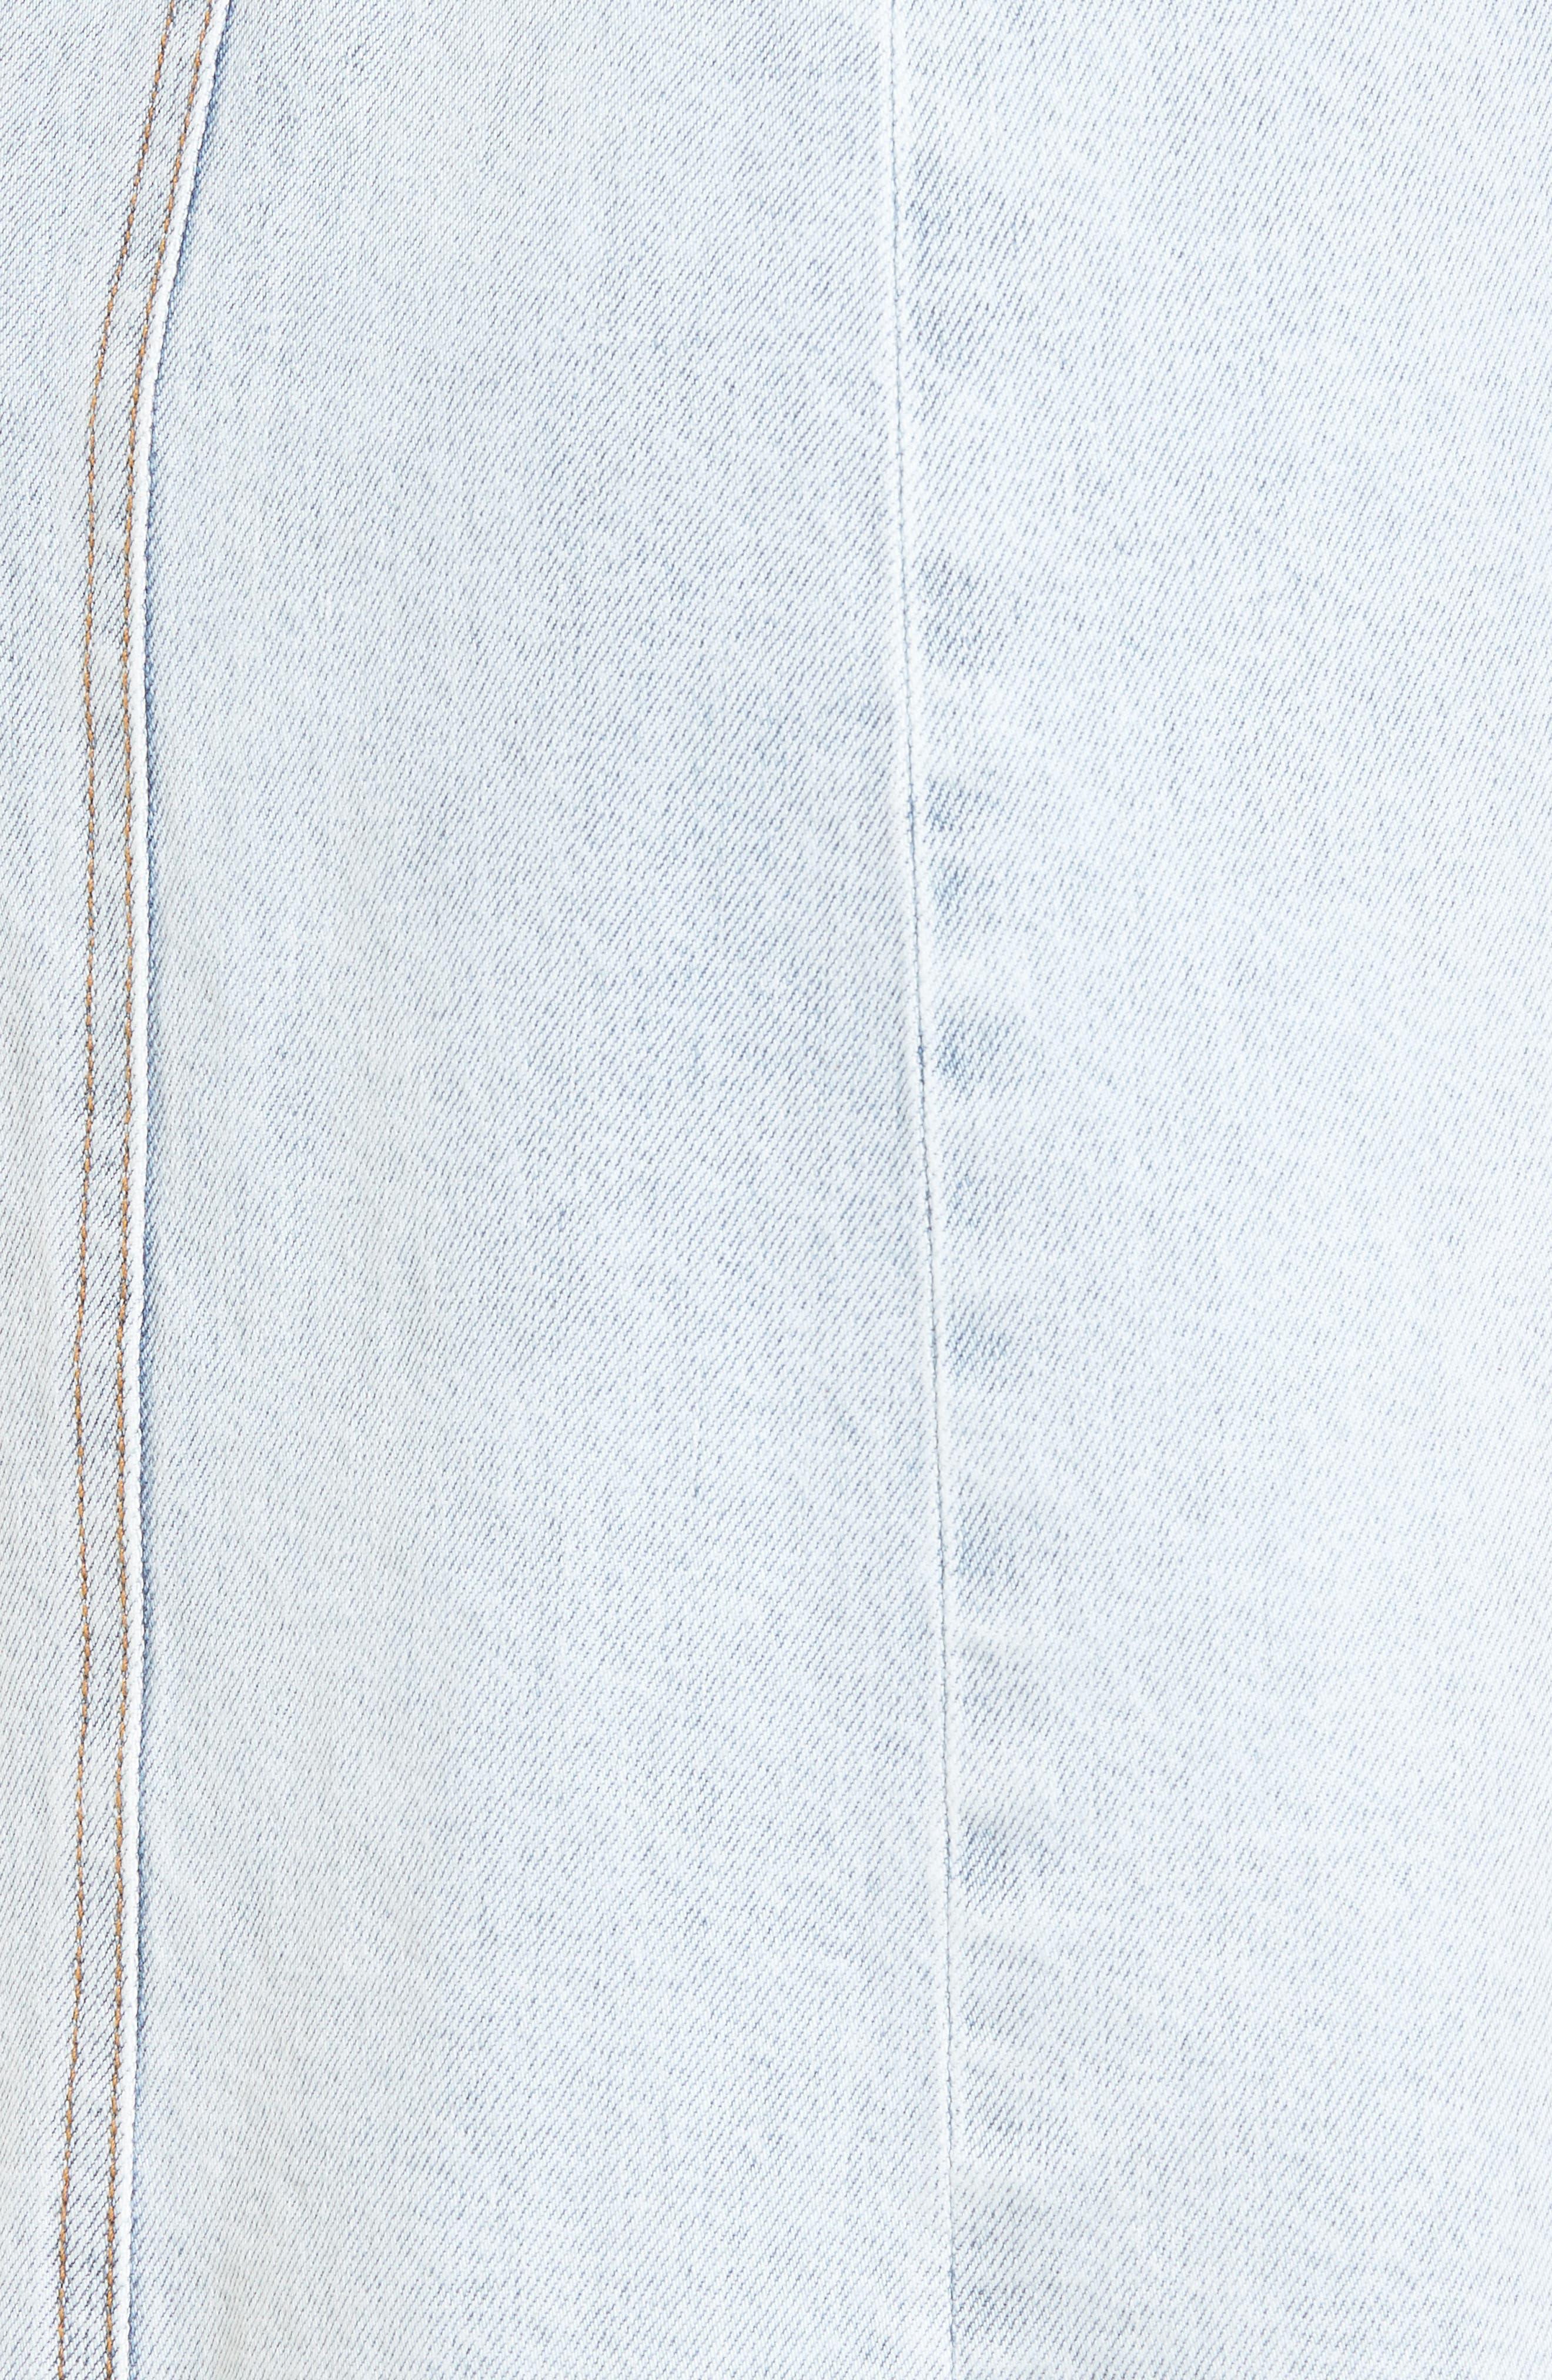 Denim Pinafore Dress,                             Alternate thumbnail 5, color,                             Desert Sun Bleached 1